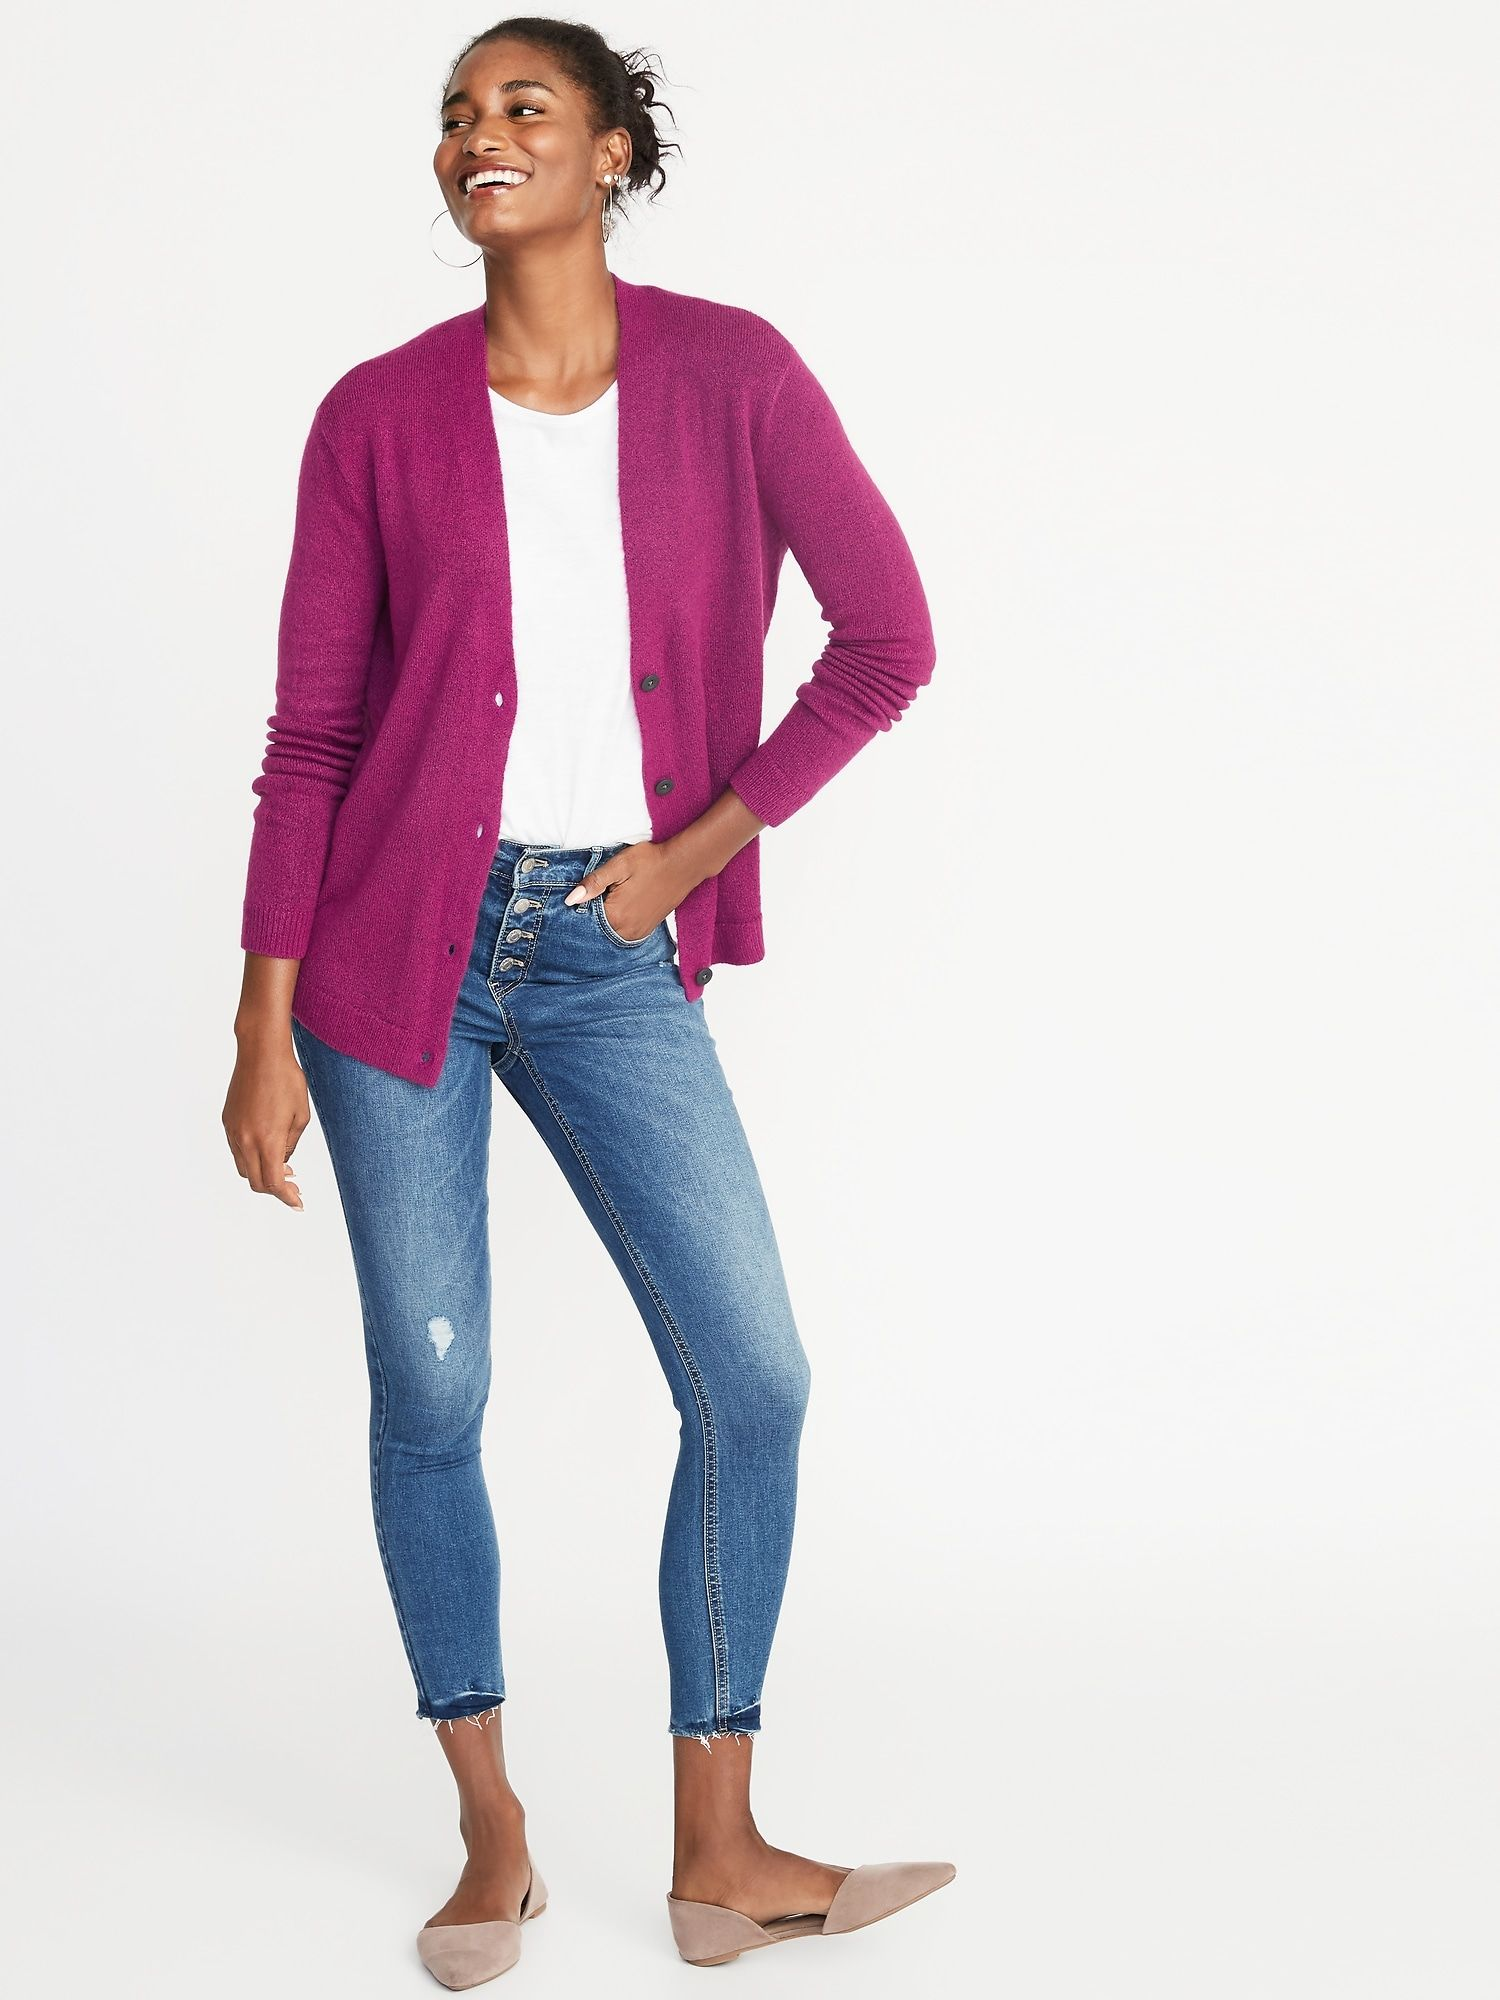 333f16e7395843 Slouchy Soft-Brushed V-Neck Cardi for Women | April Love List 2019 ...